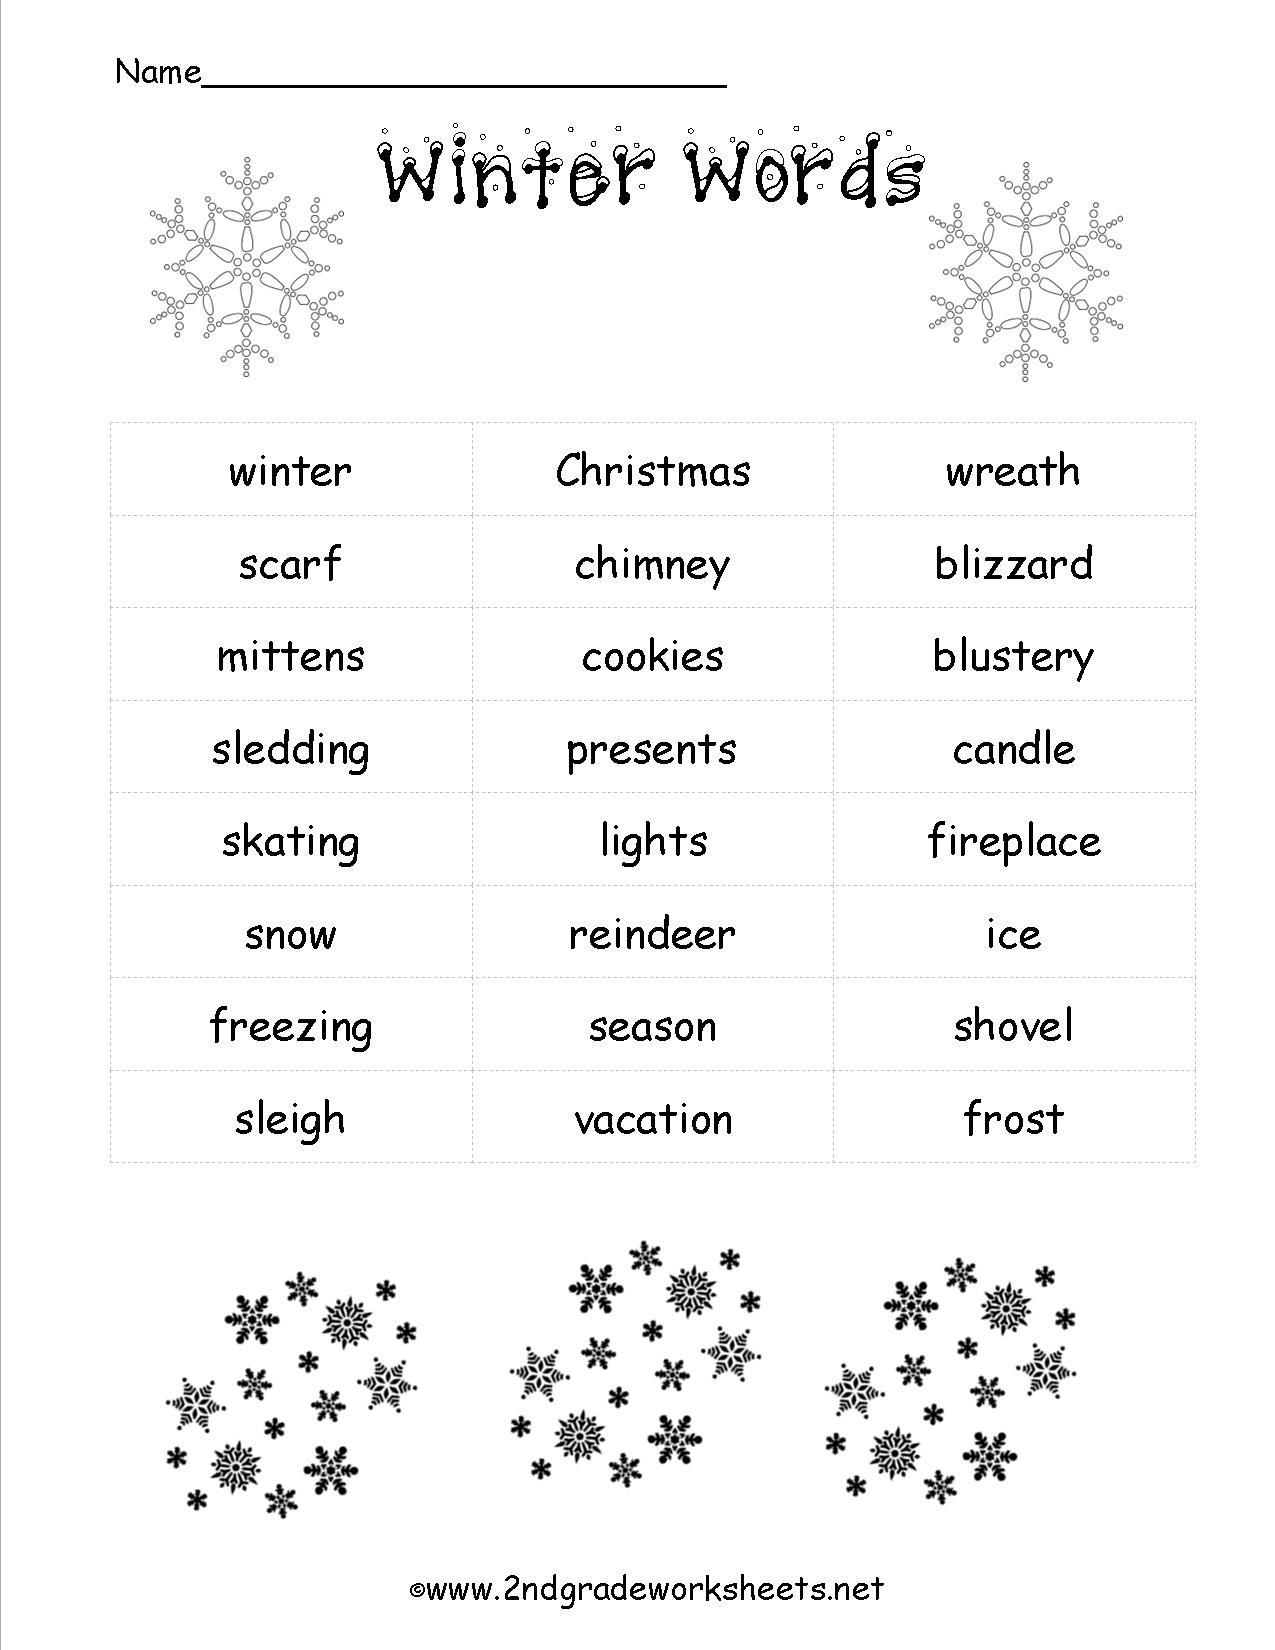 Christmas Worksheets And Printouts - Free Printable Christmas Maths Worksheets Ks1